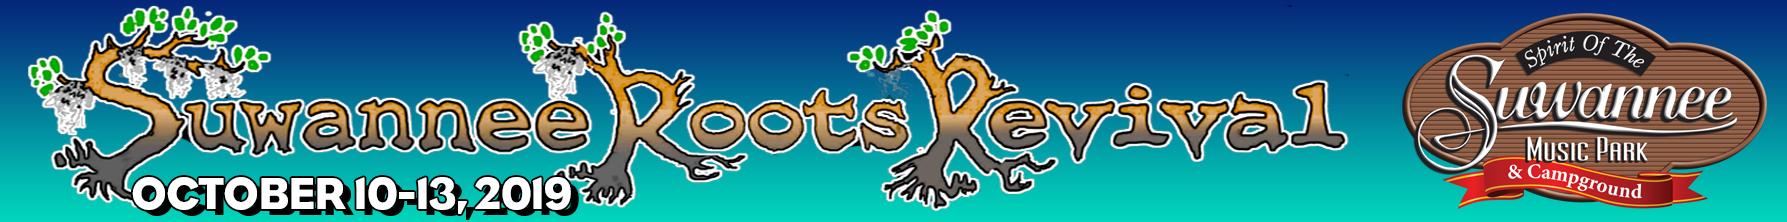 Suwannee Roots Revival | Oct 10-13, 2019